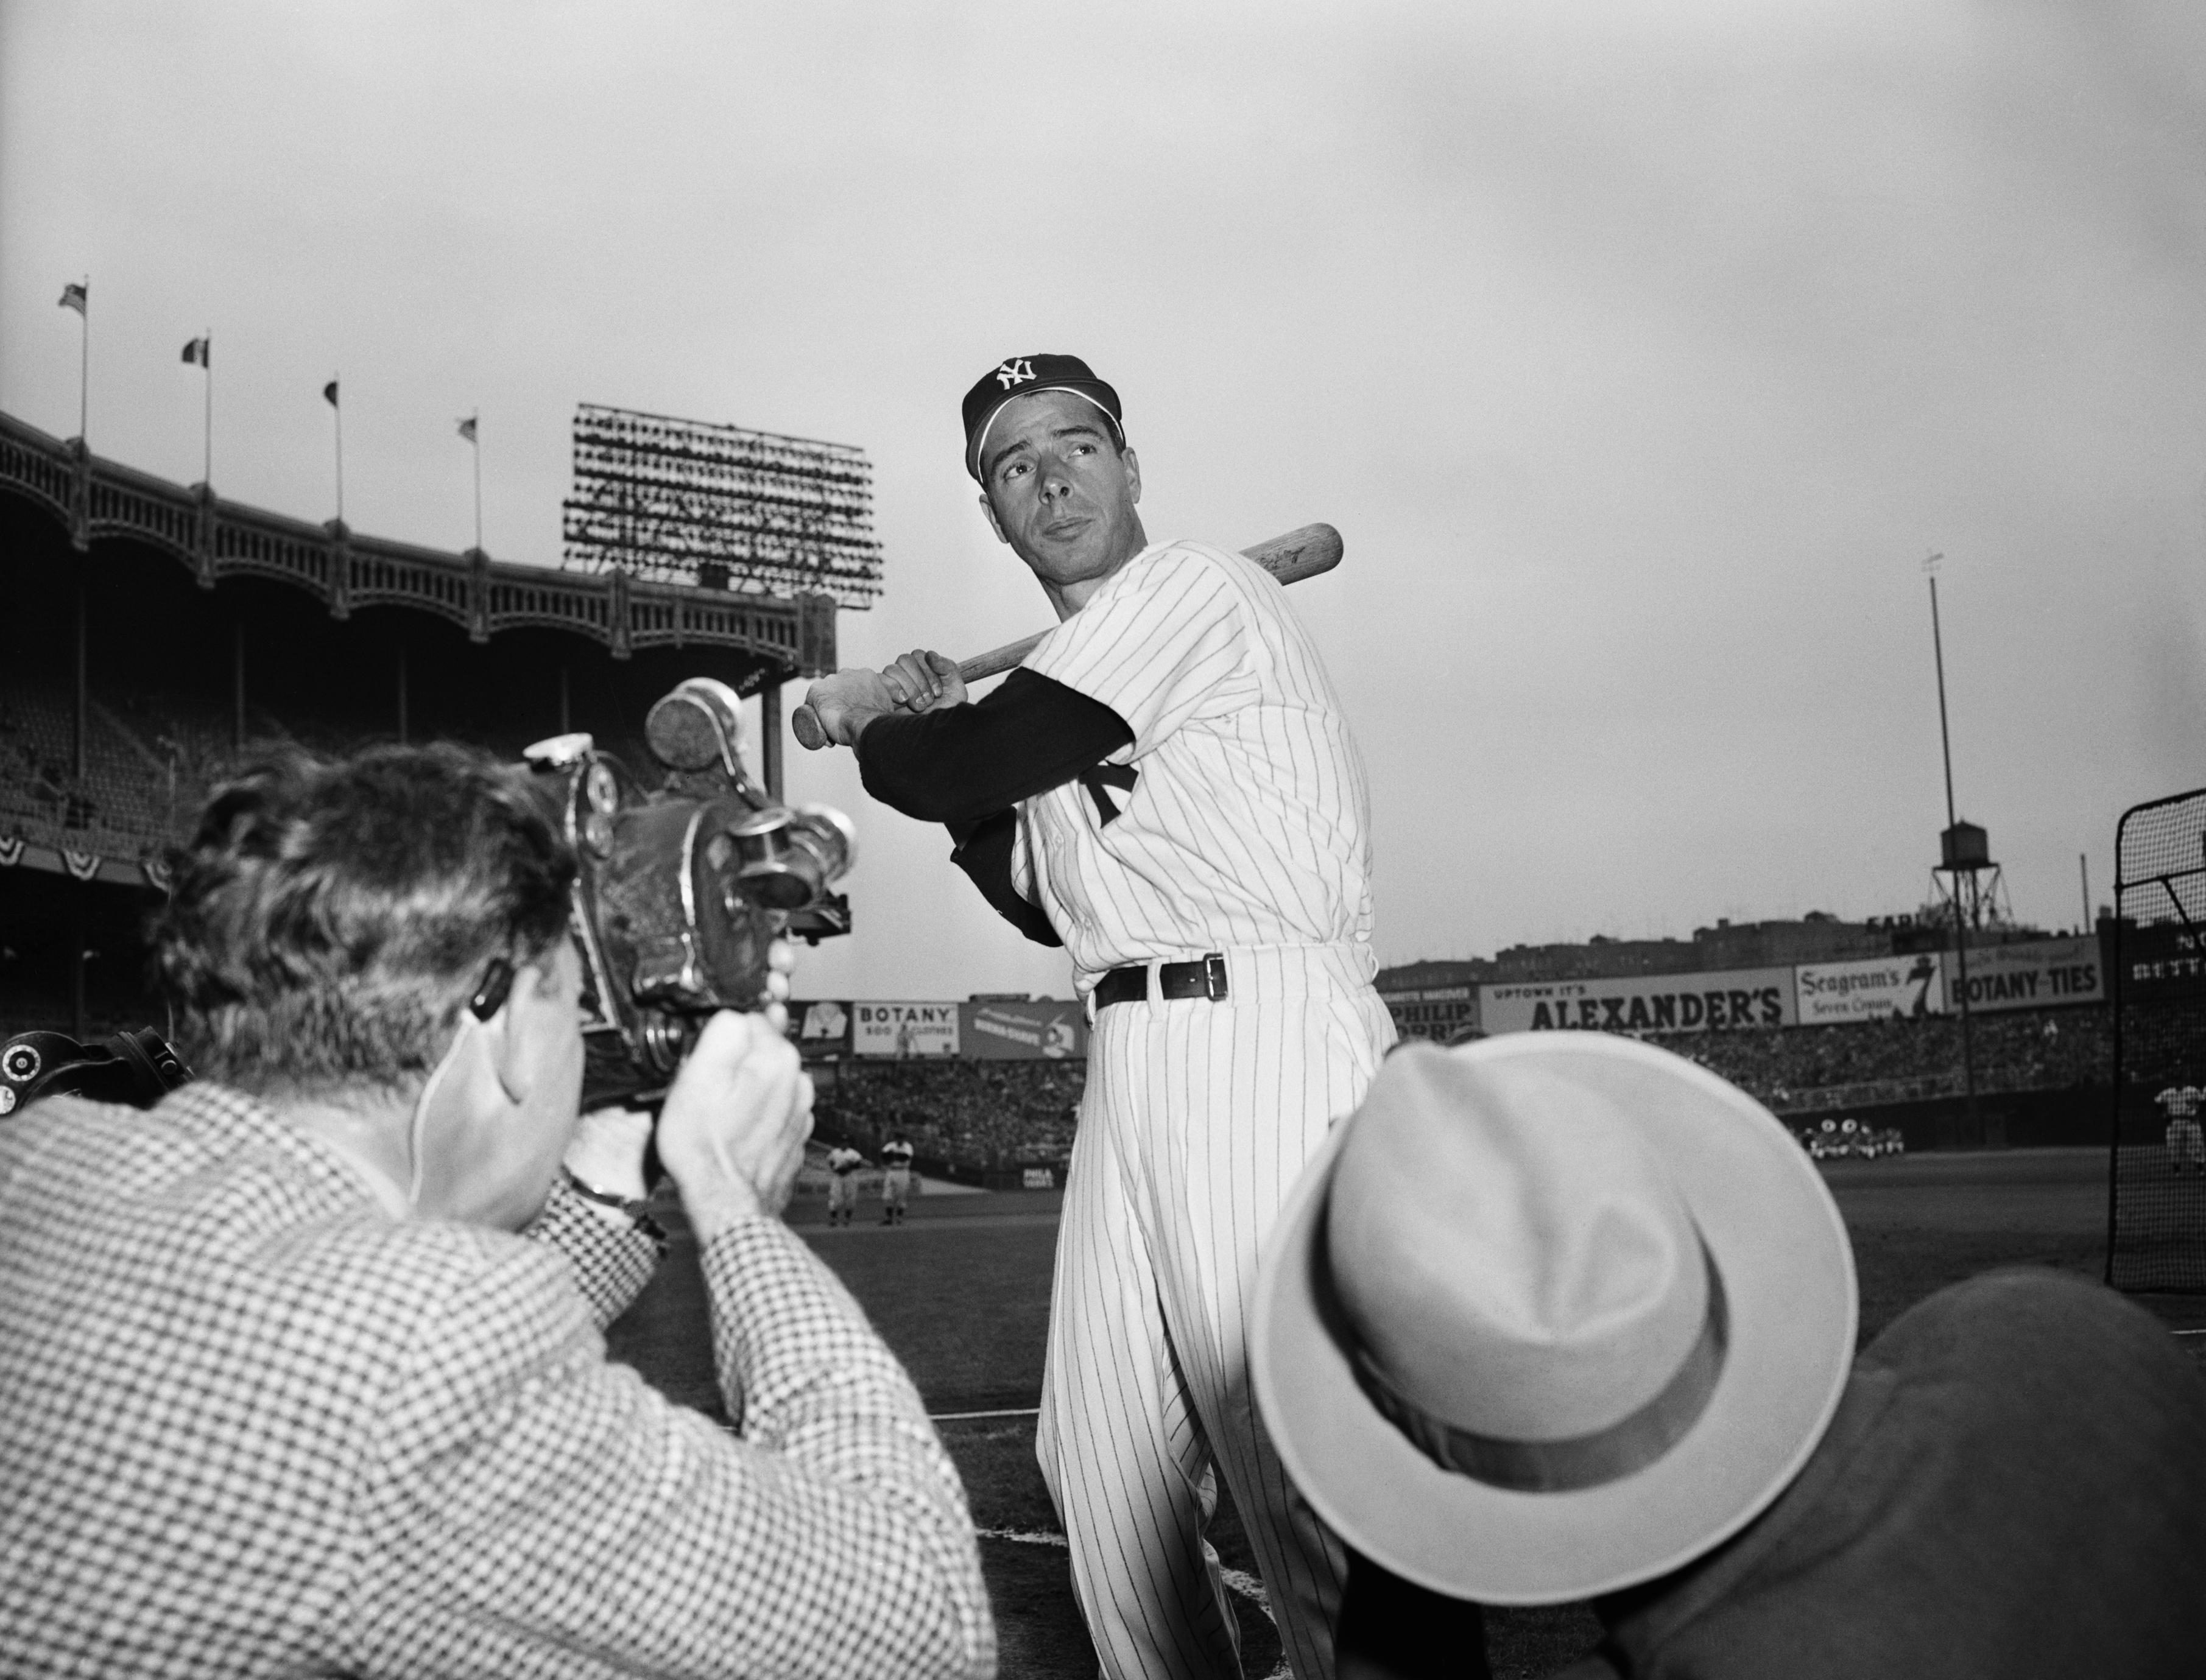 Joe DiMaggio Posing for Photographers